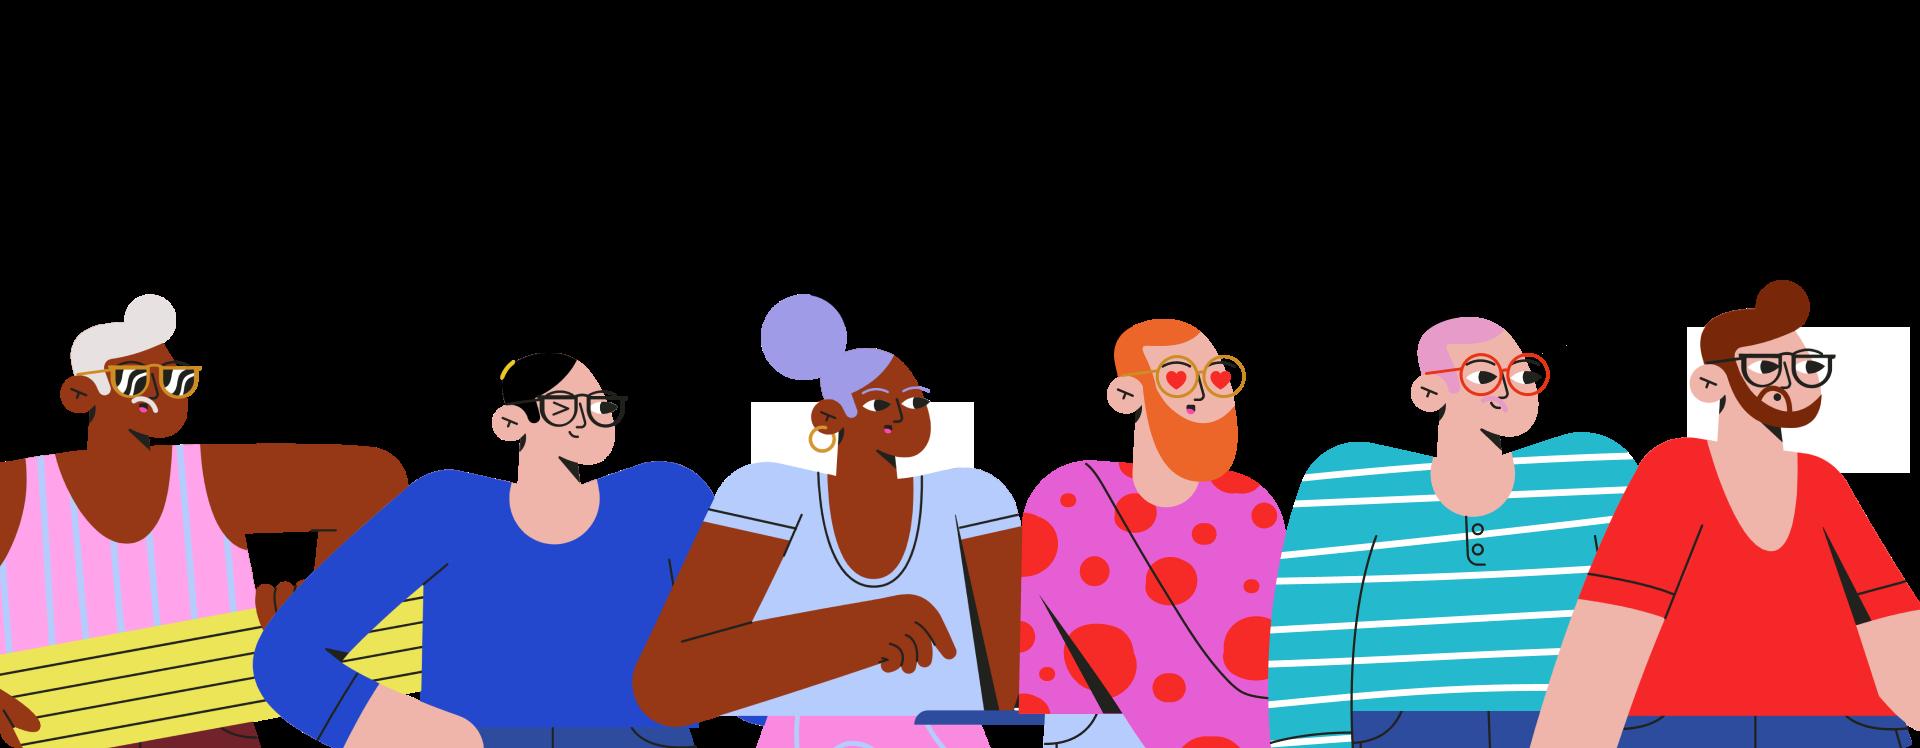 Amigos illustrations